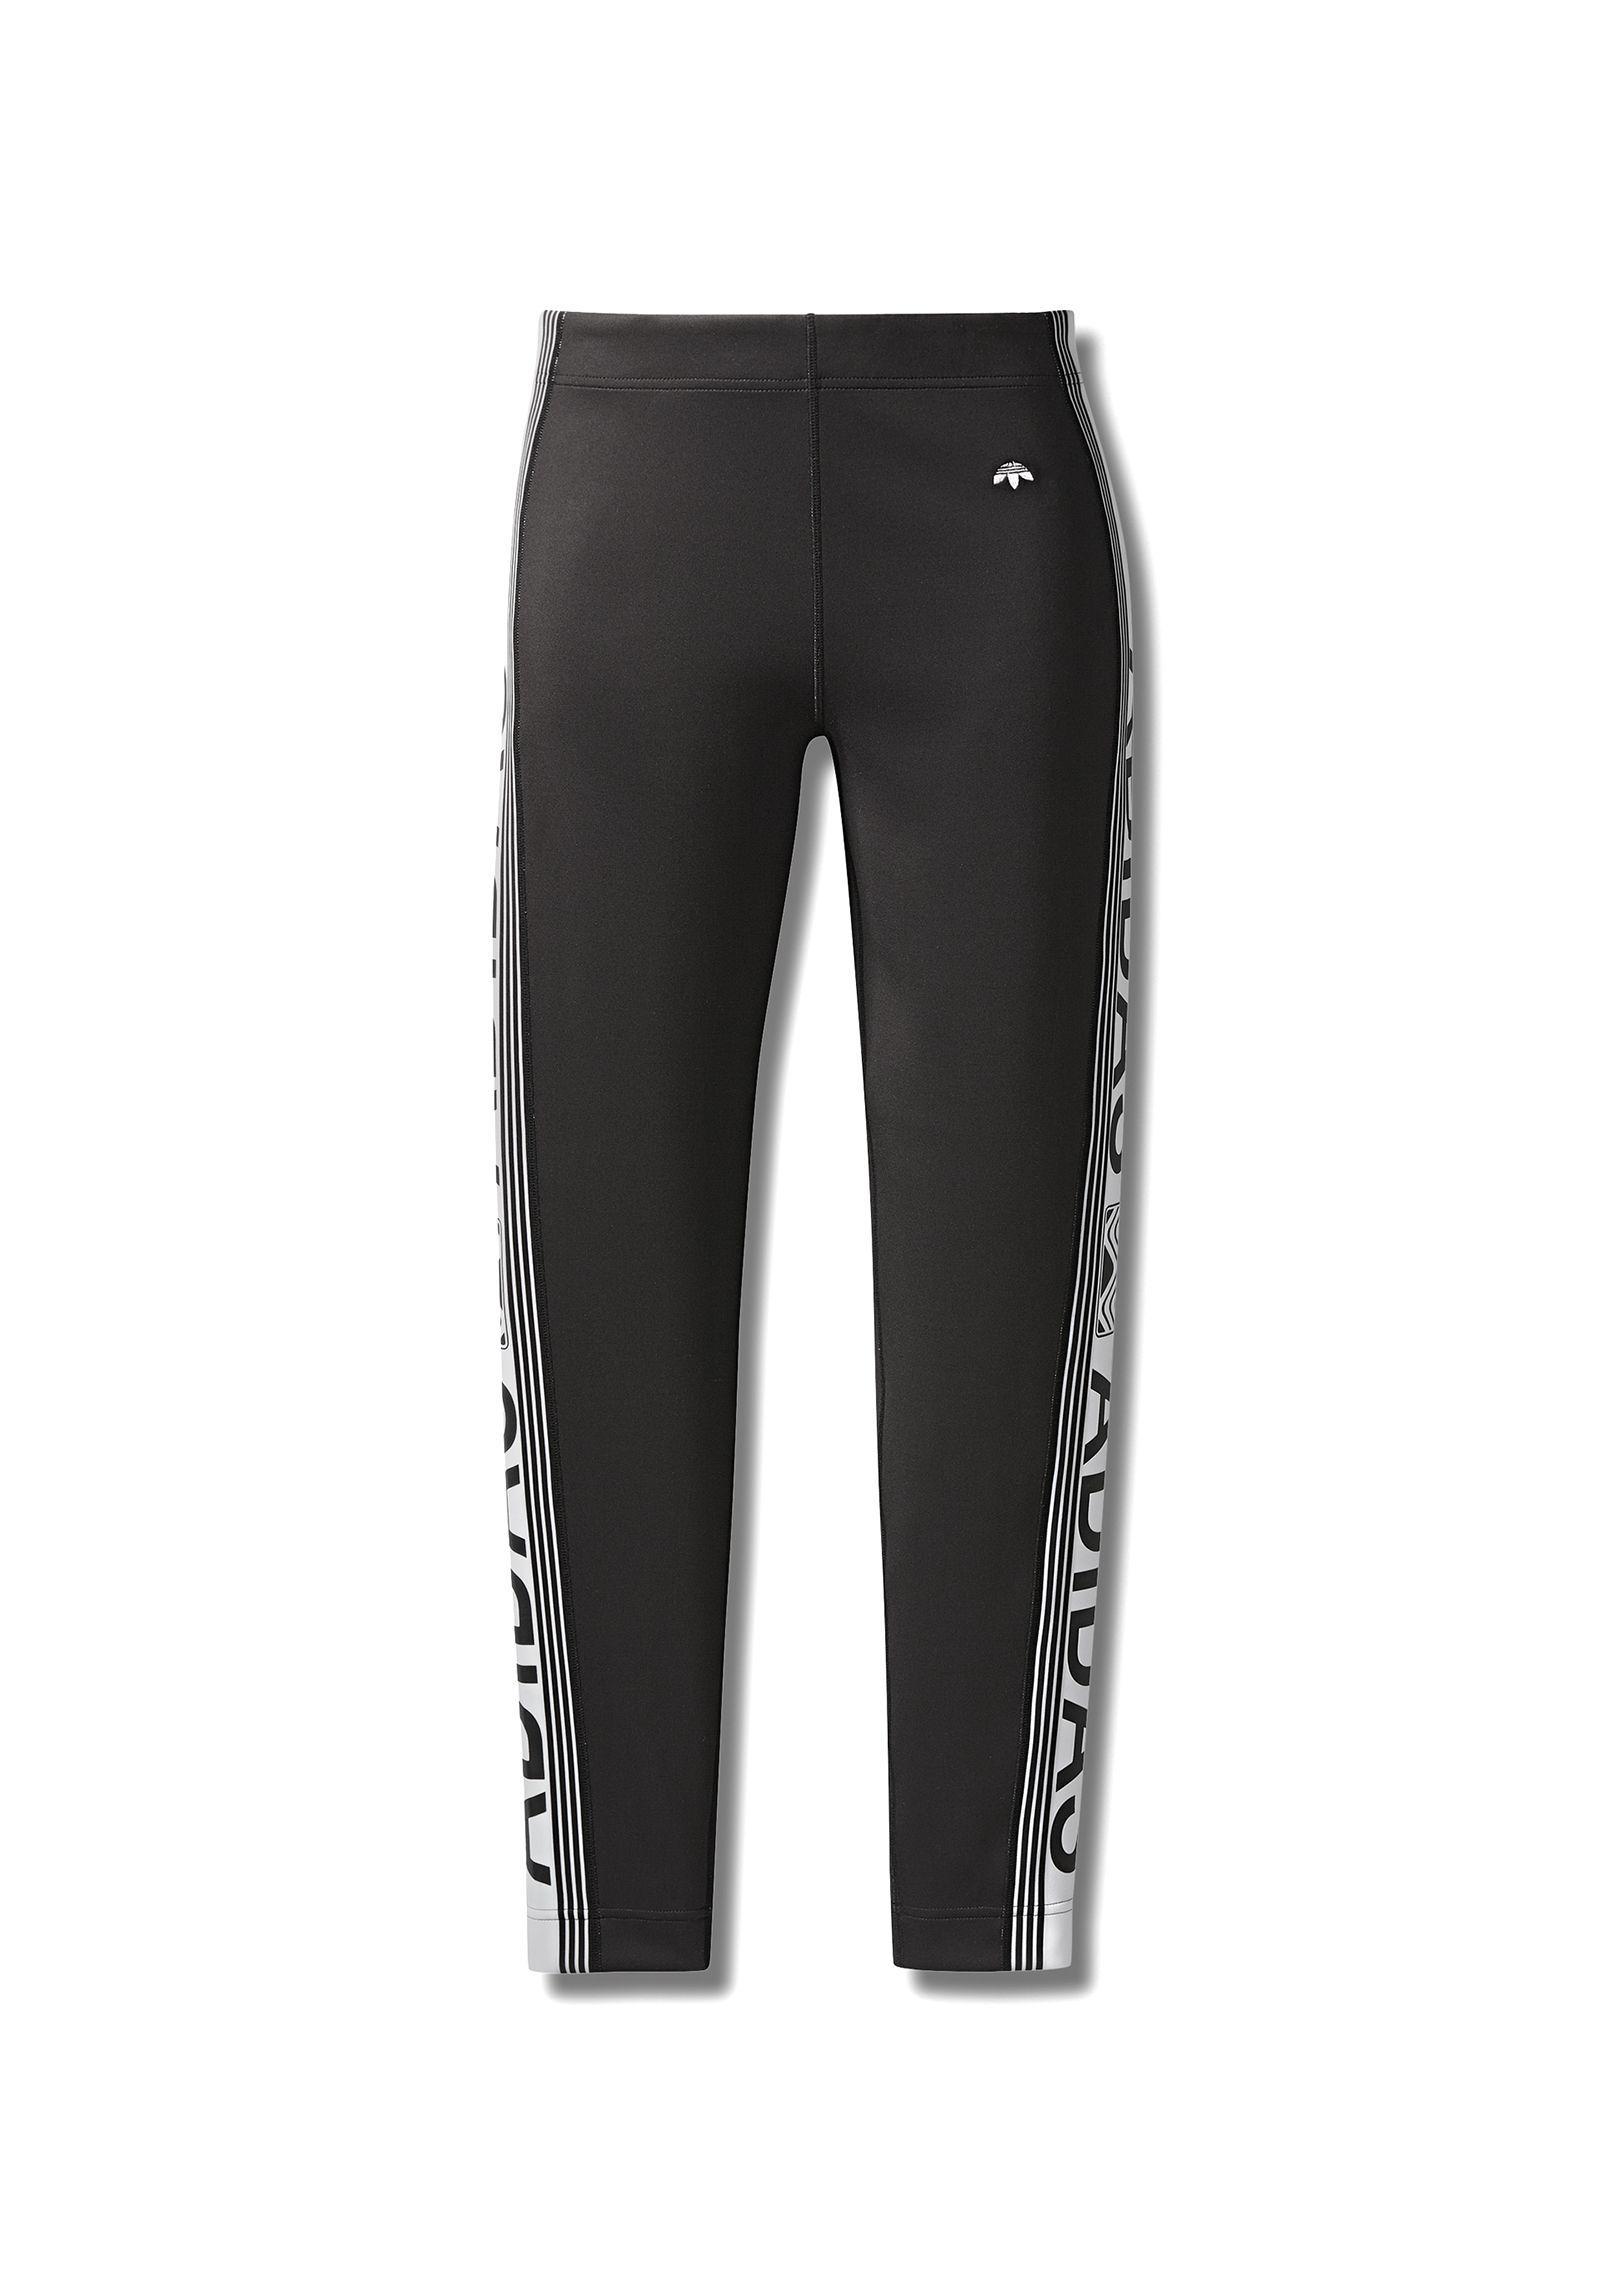 Adidas Black Originals In Leggings Aw By Wang Cycling Lyst Alexander q4w7qO